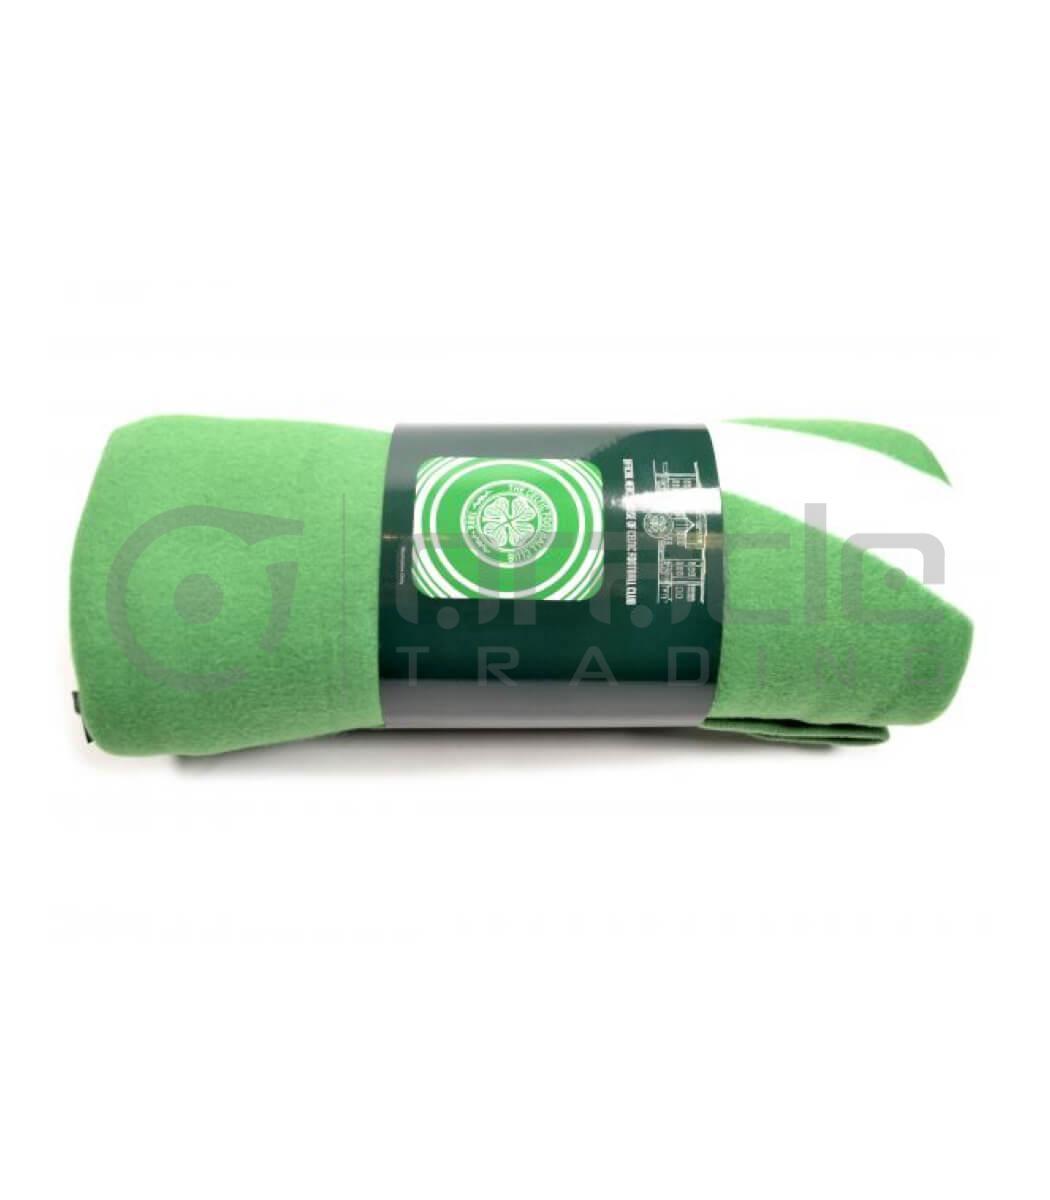 Celtic Fleece Blanket